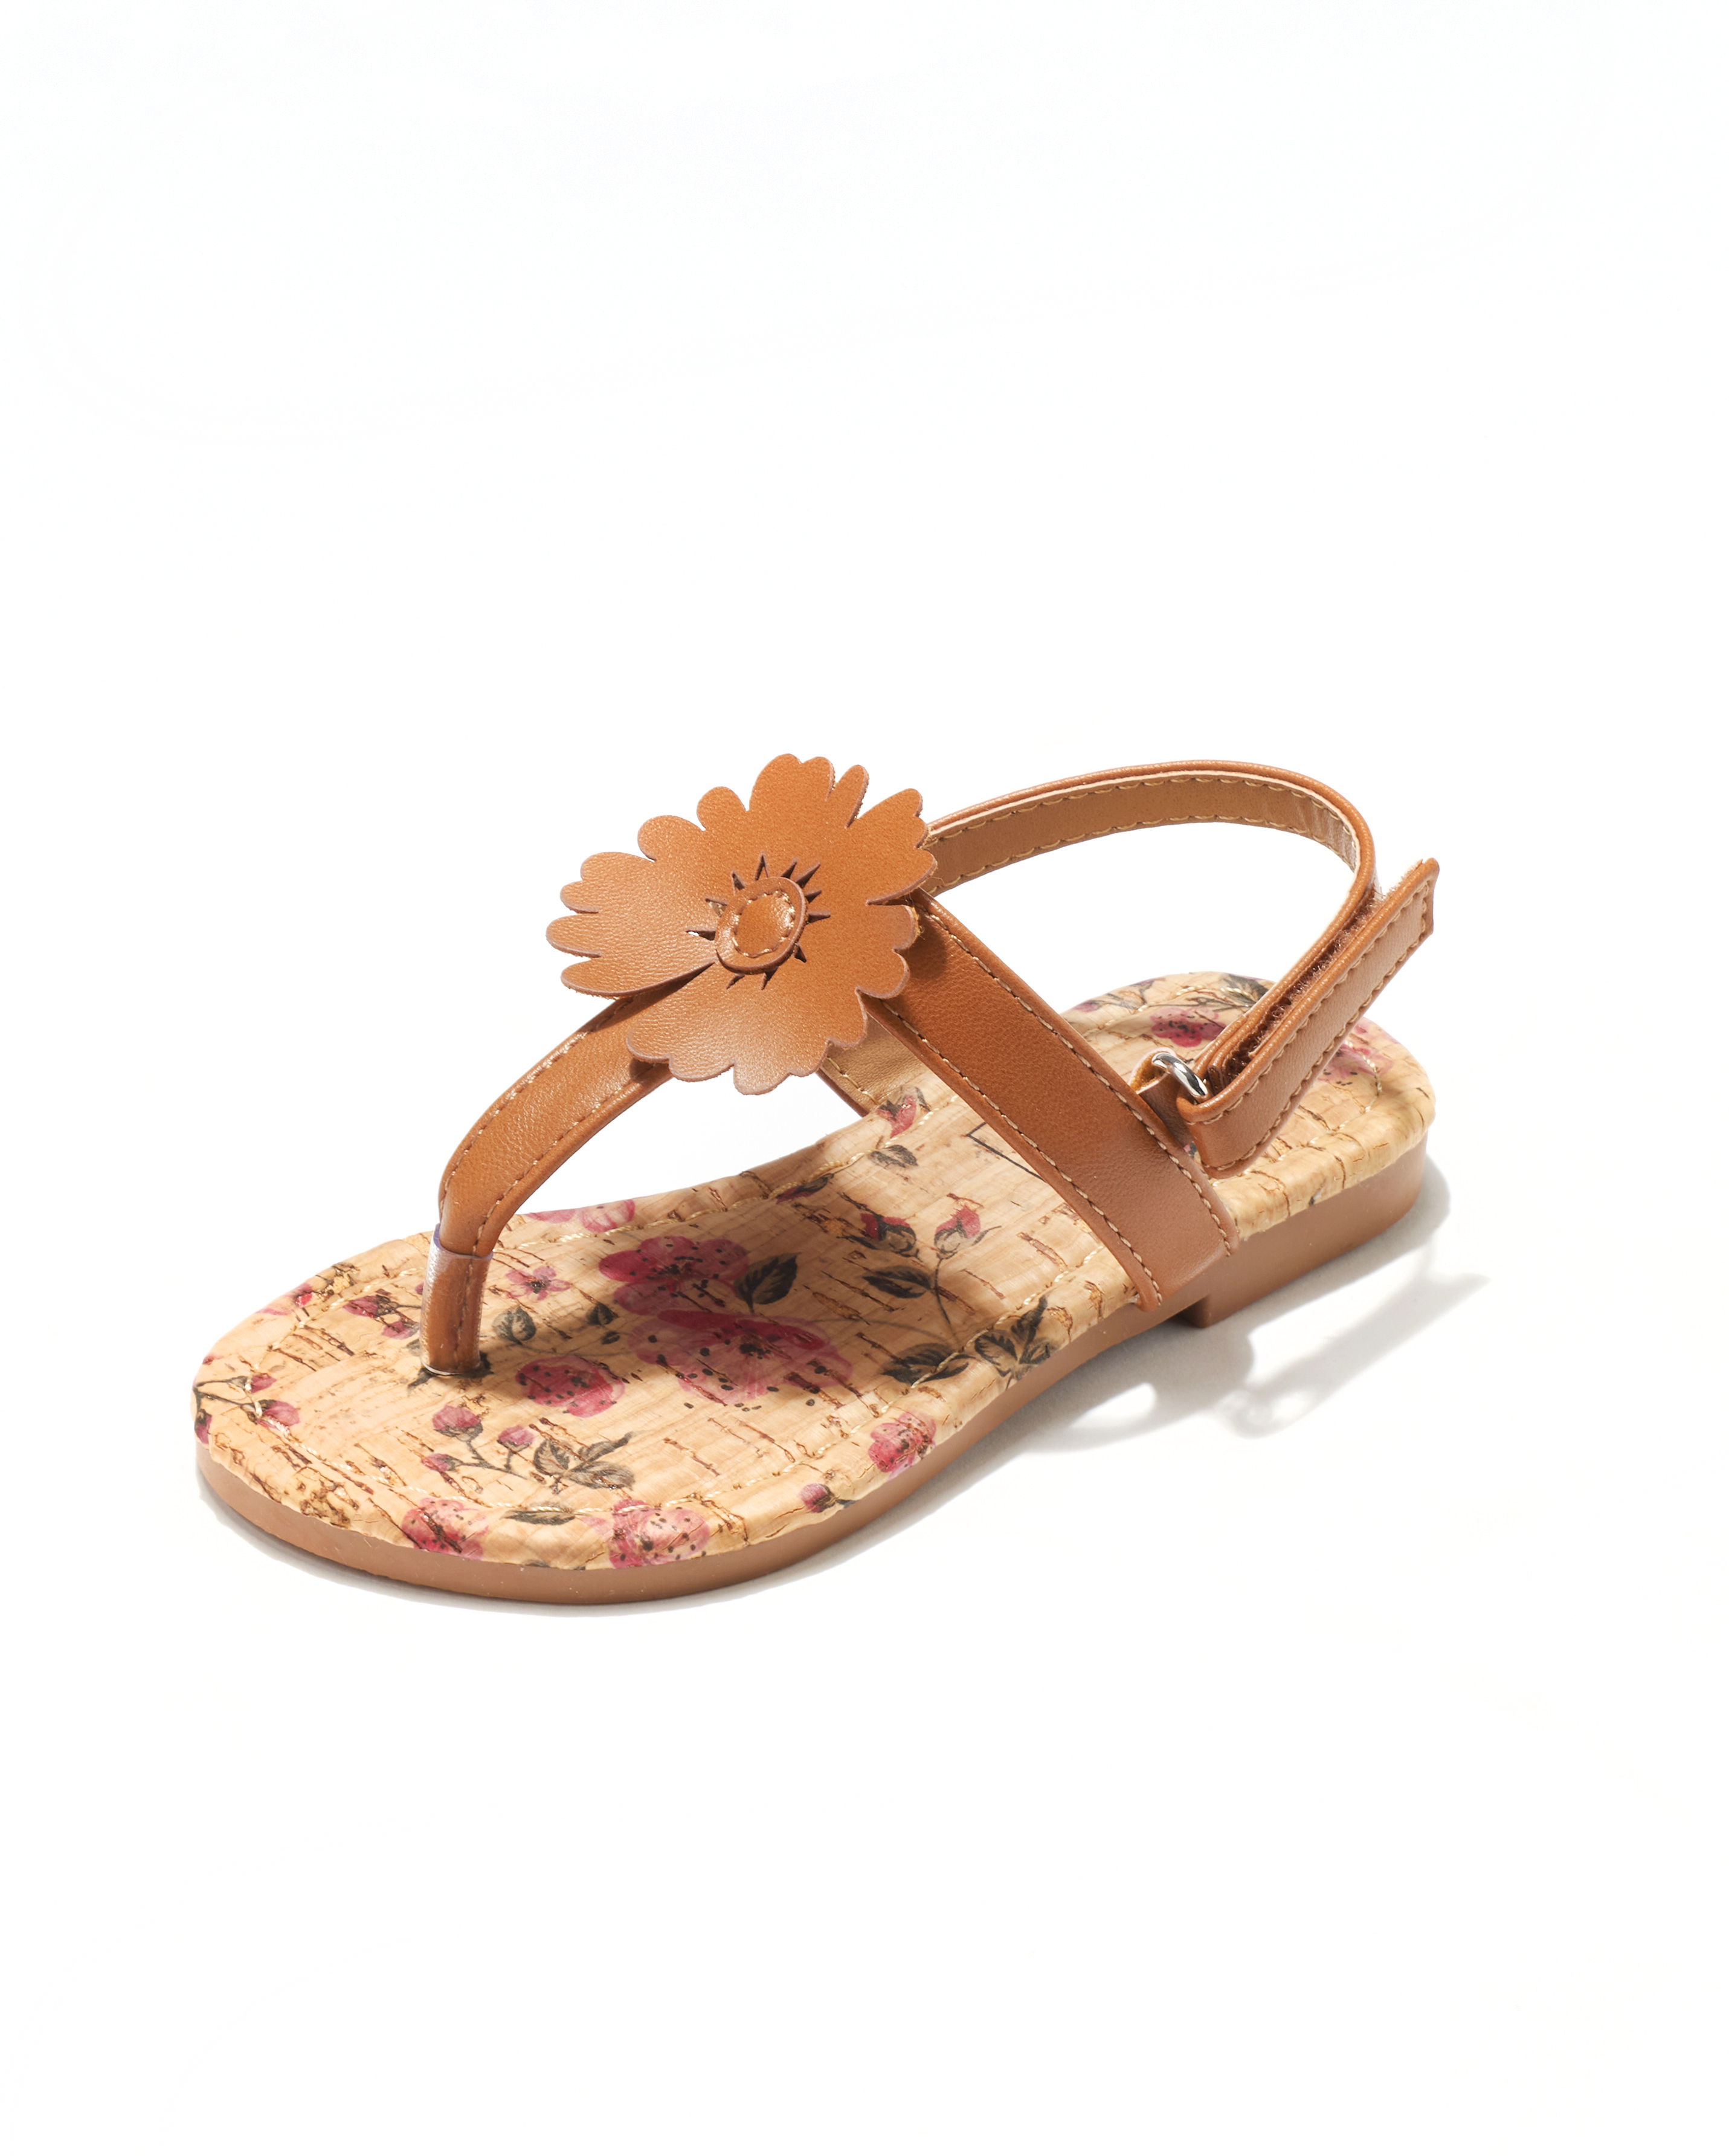 Sandales Fille - Sandale Ouverte Camel Jina - Saou Freewalk3